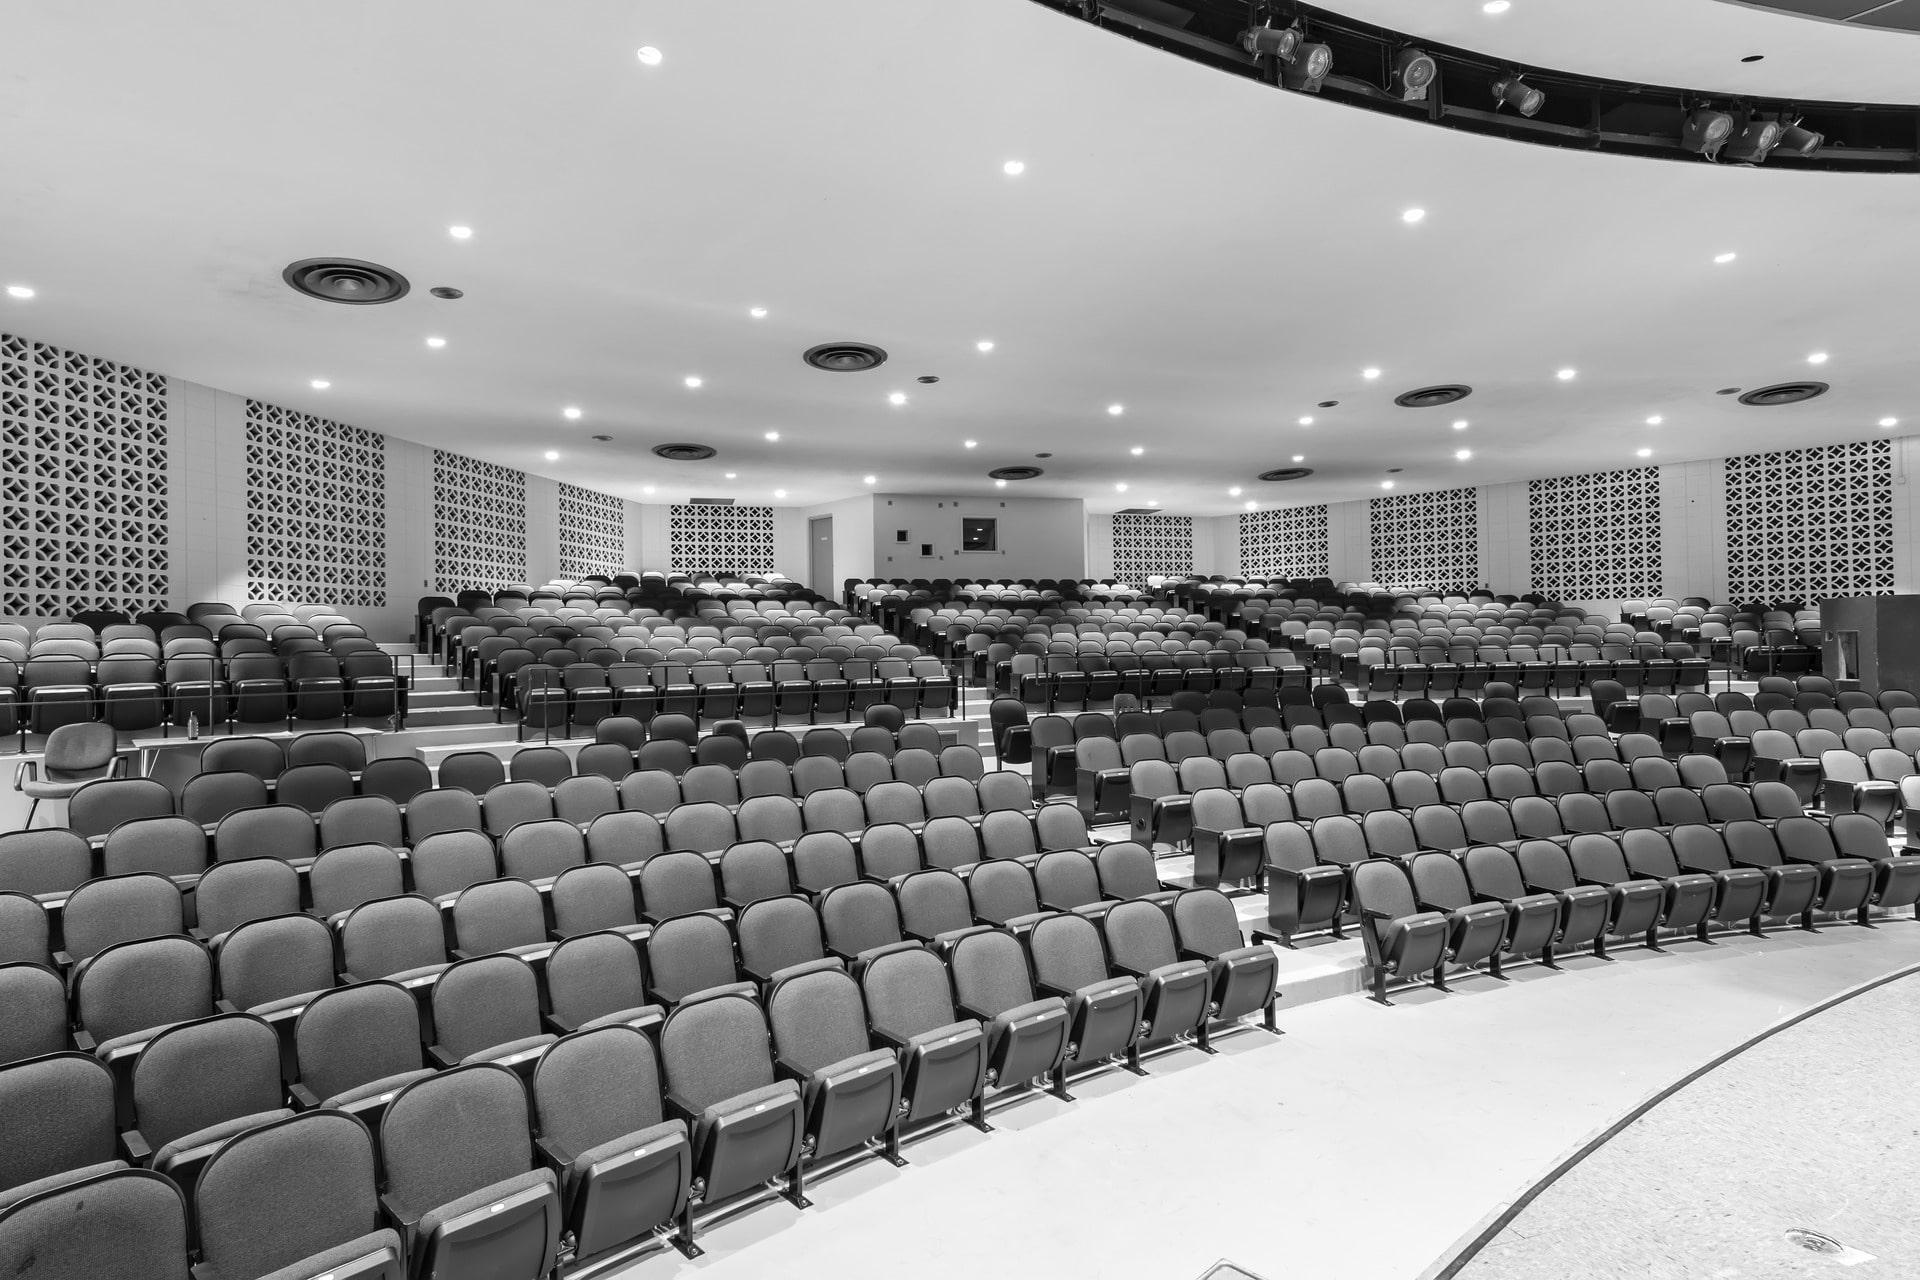 Kankakee Auditorium Before